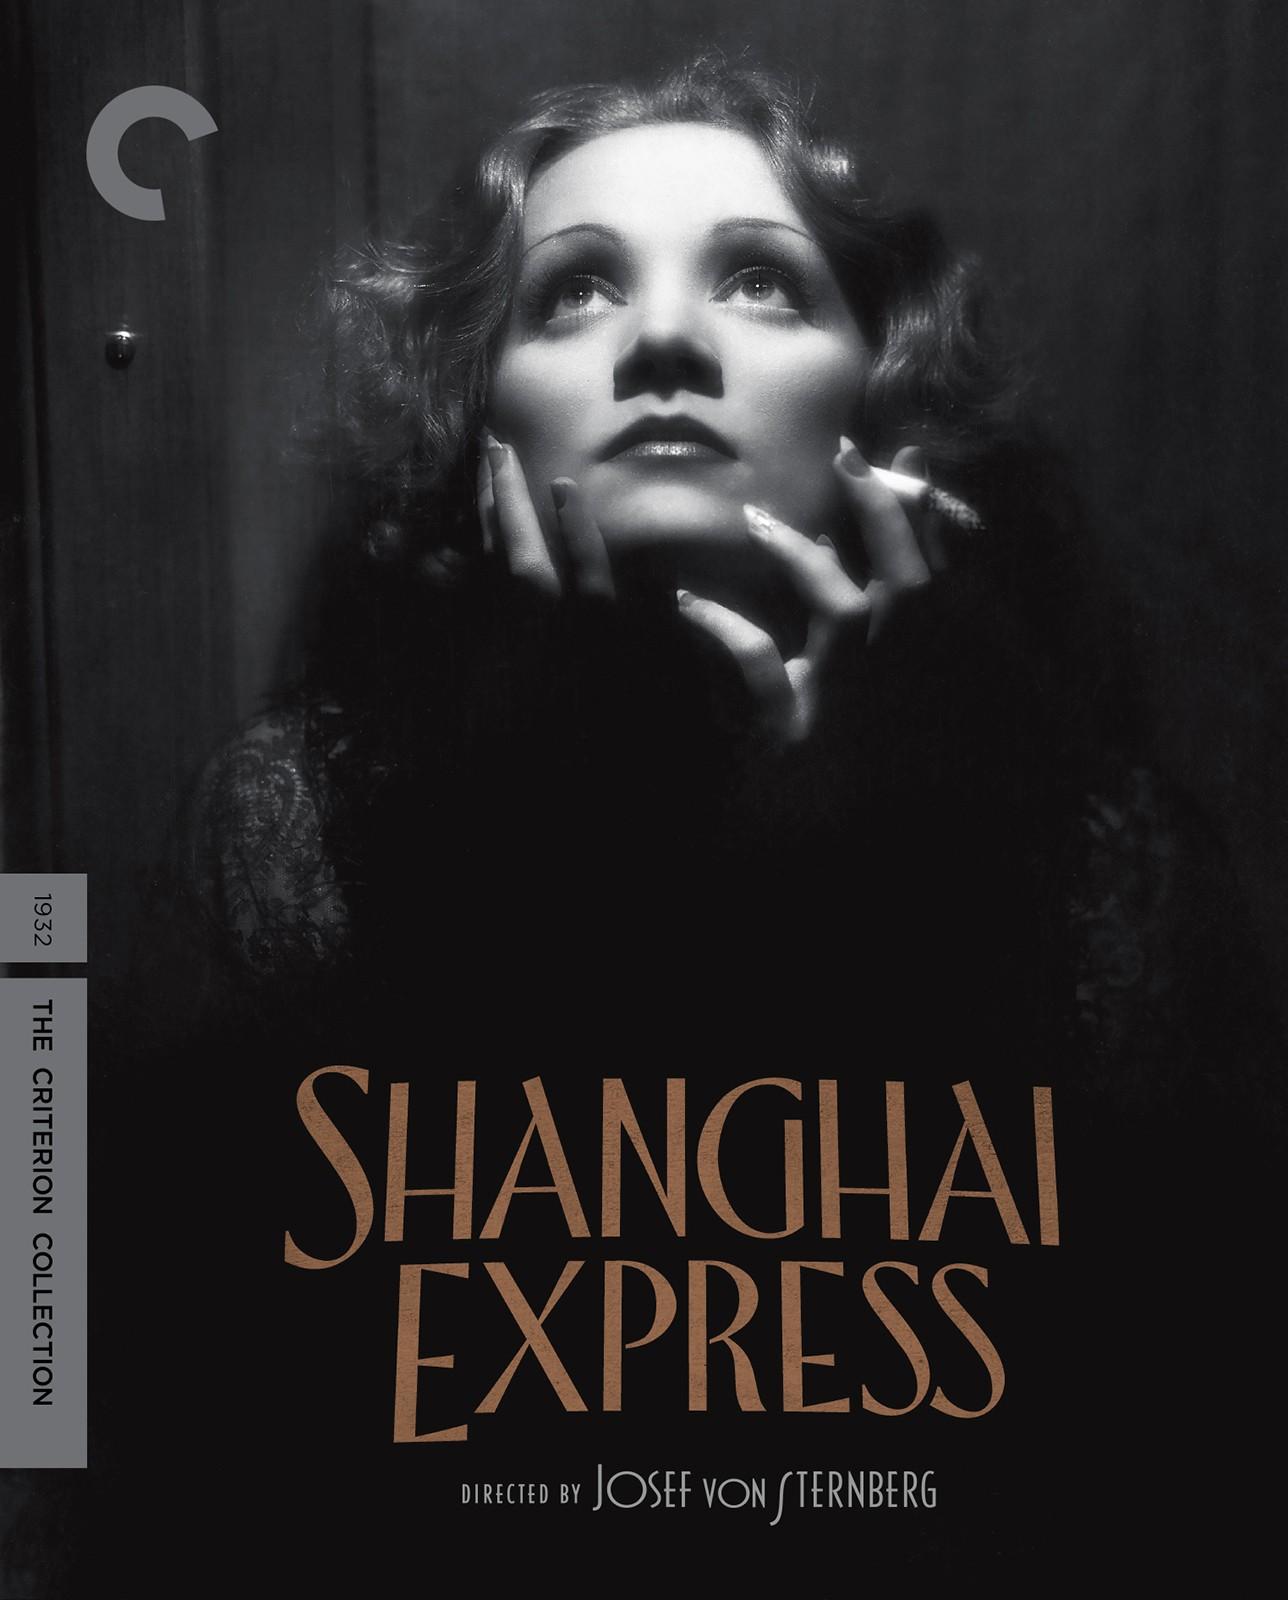 مشاهدة فيلم Shanghai Express 1932 مترجم